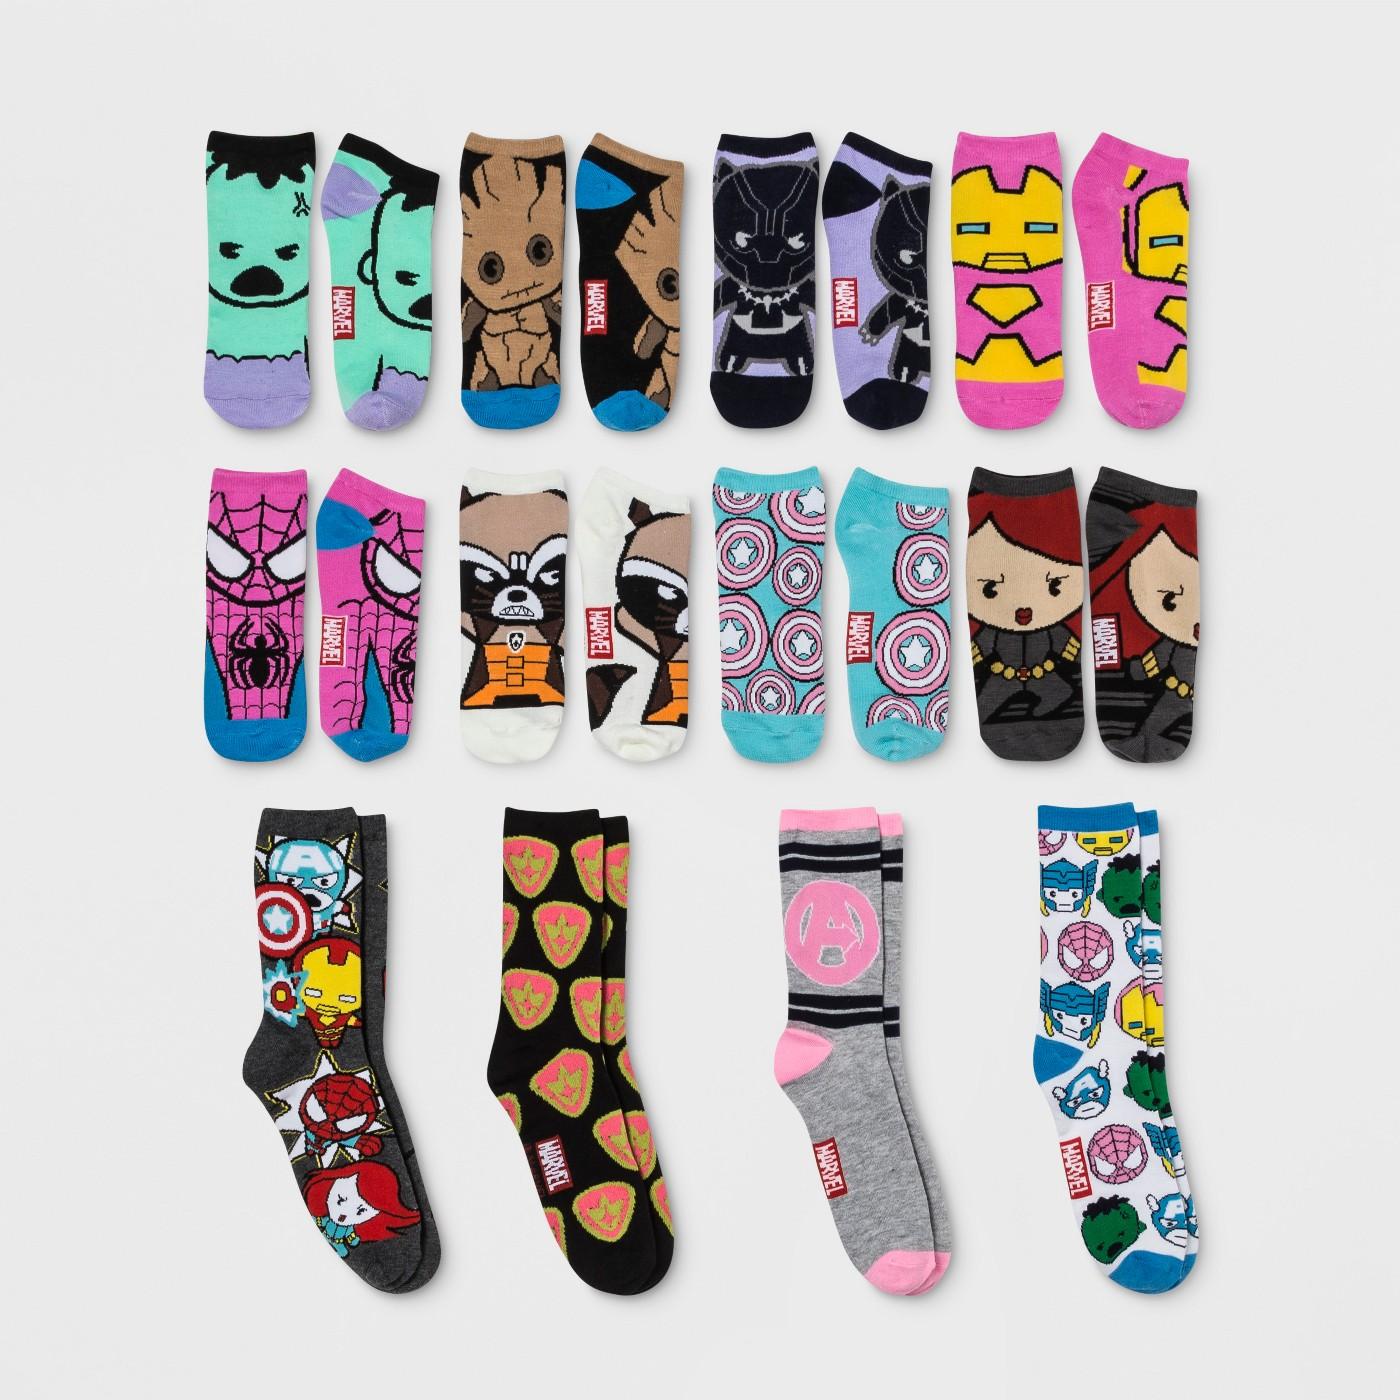 f14d2ba75f8 Women s 12 Days of Socks Advent Calendar (various styles ...